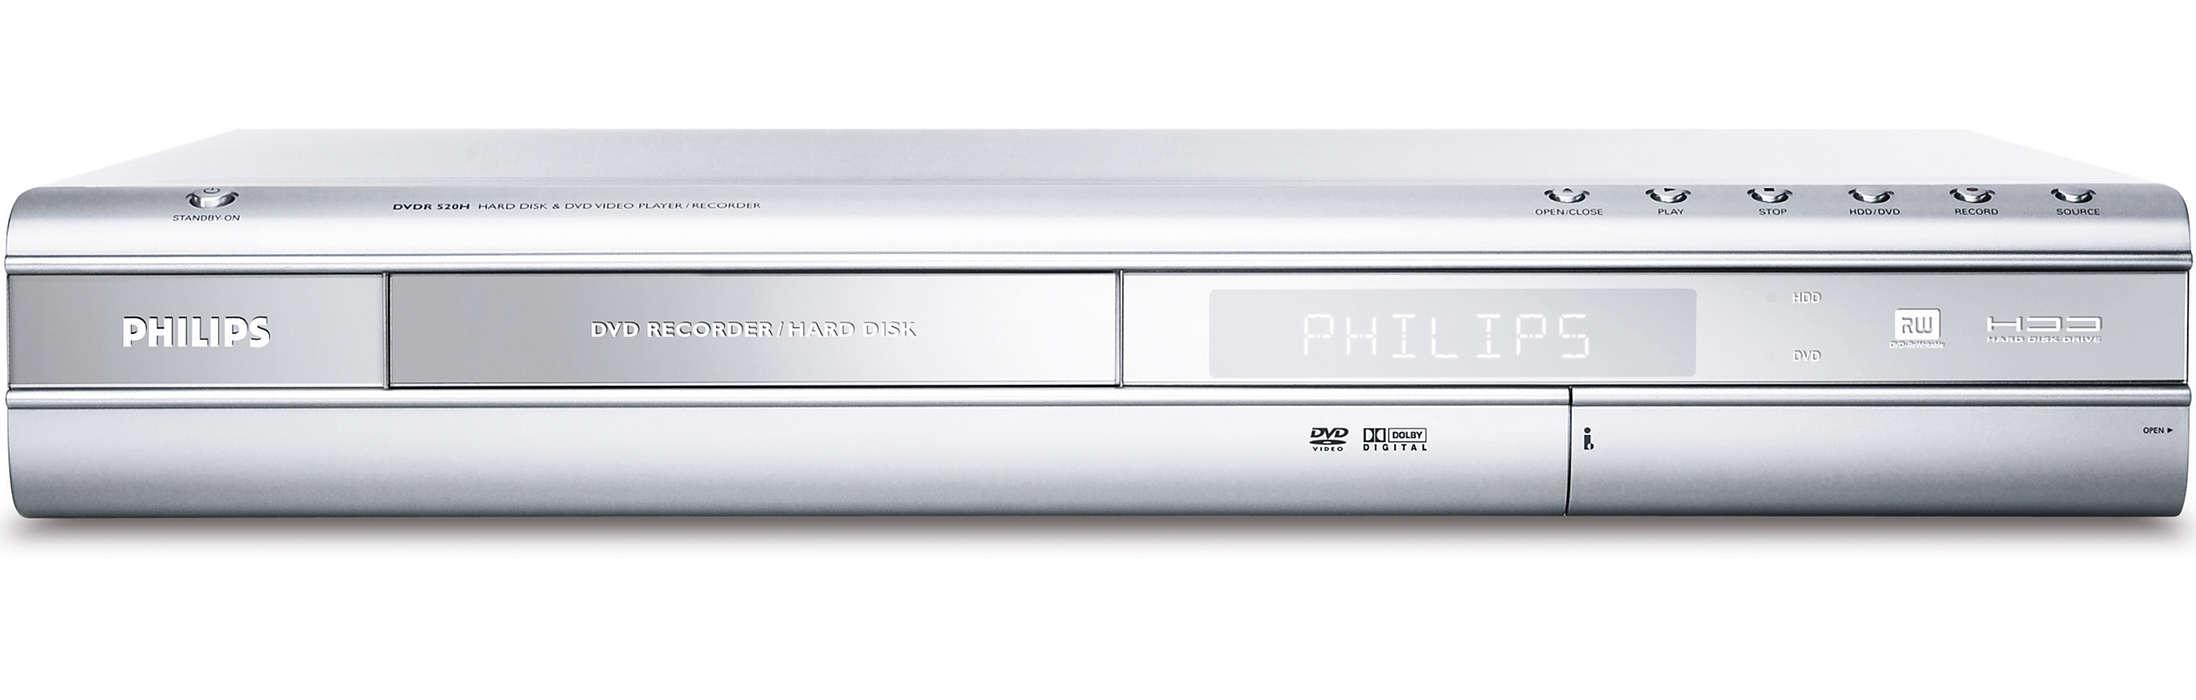 DVD 錄影機/硬碟